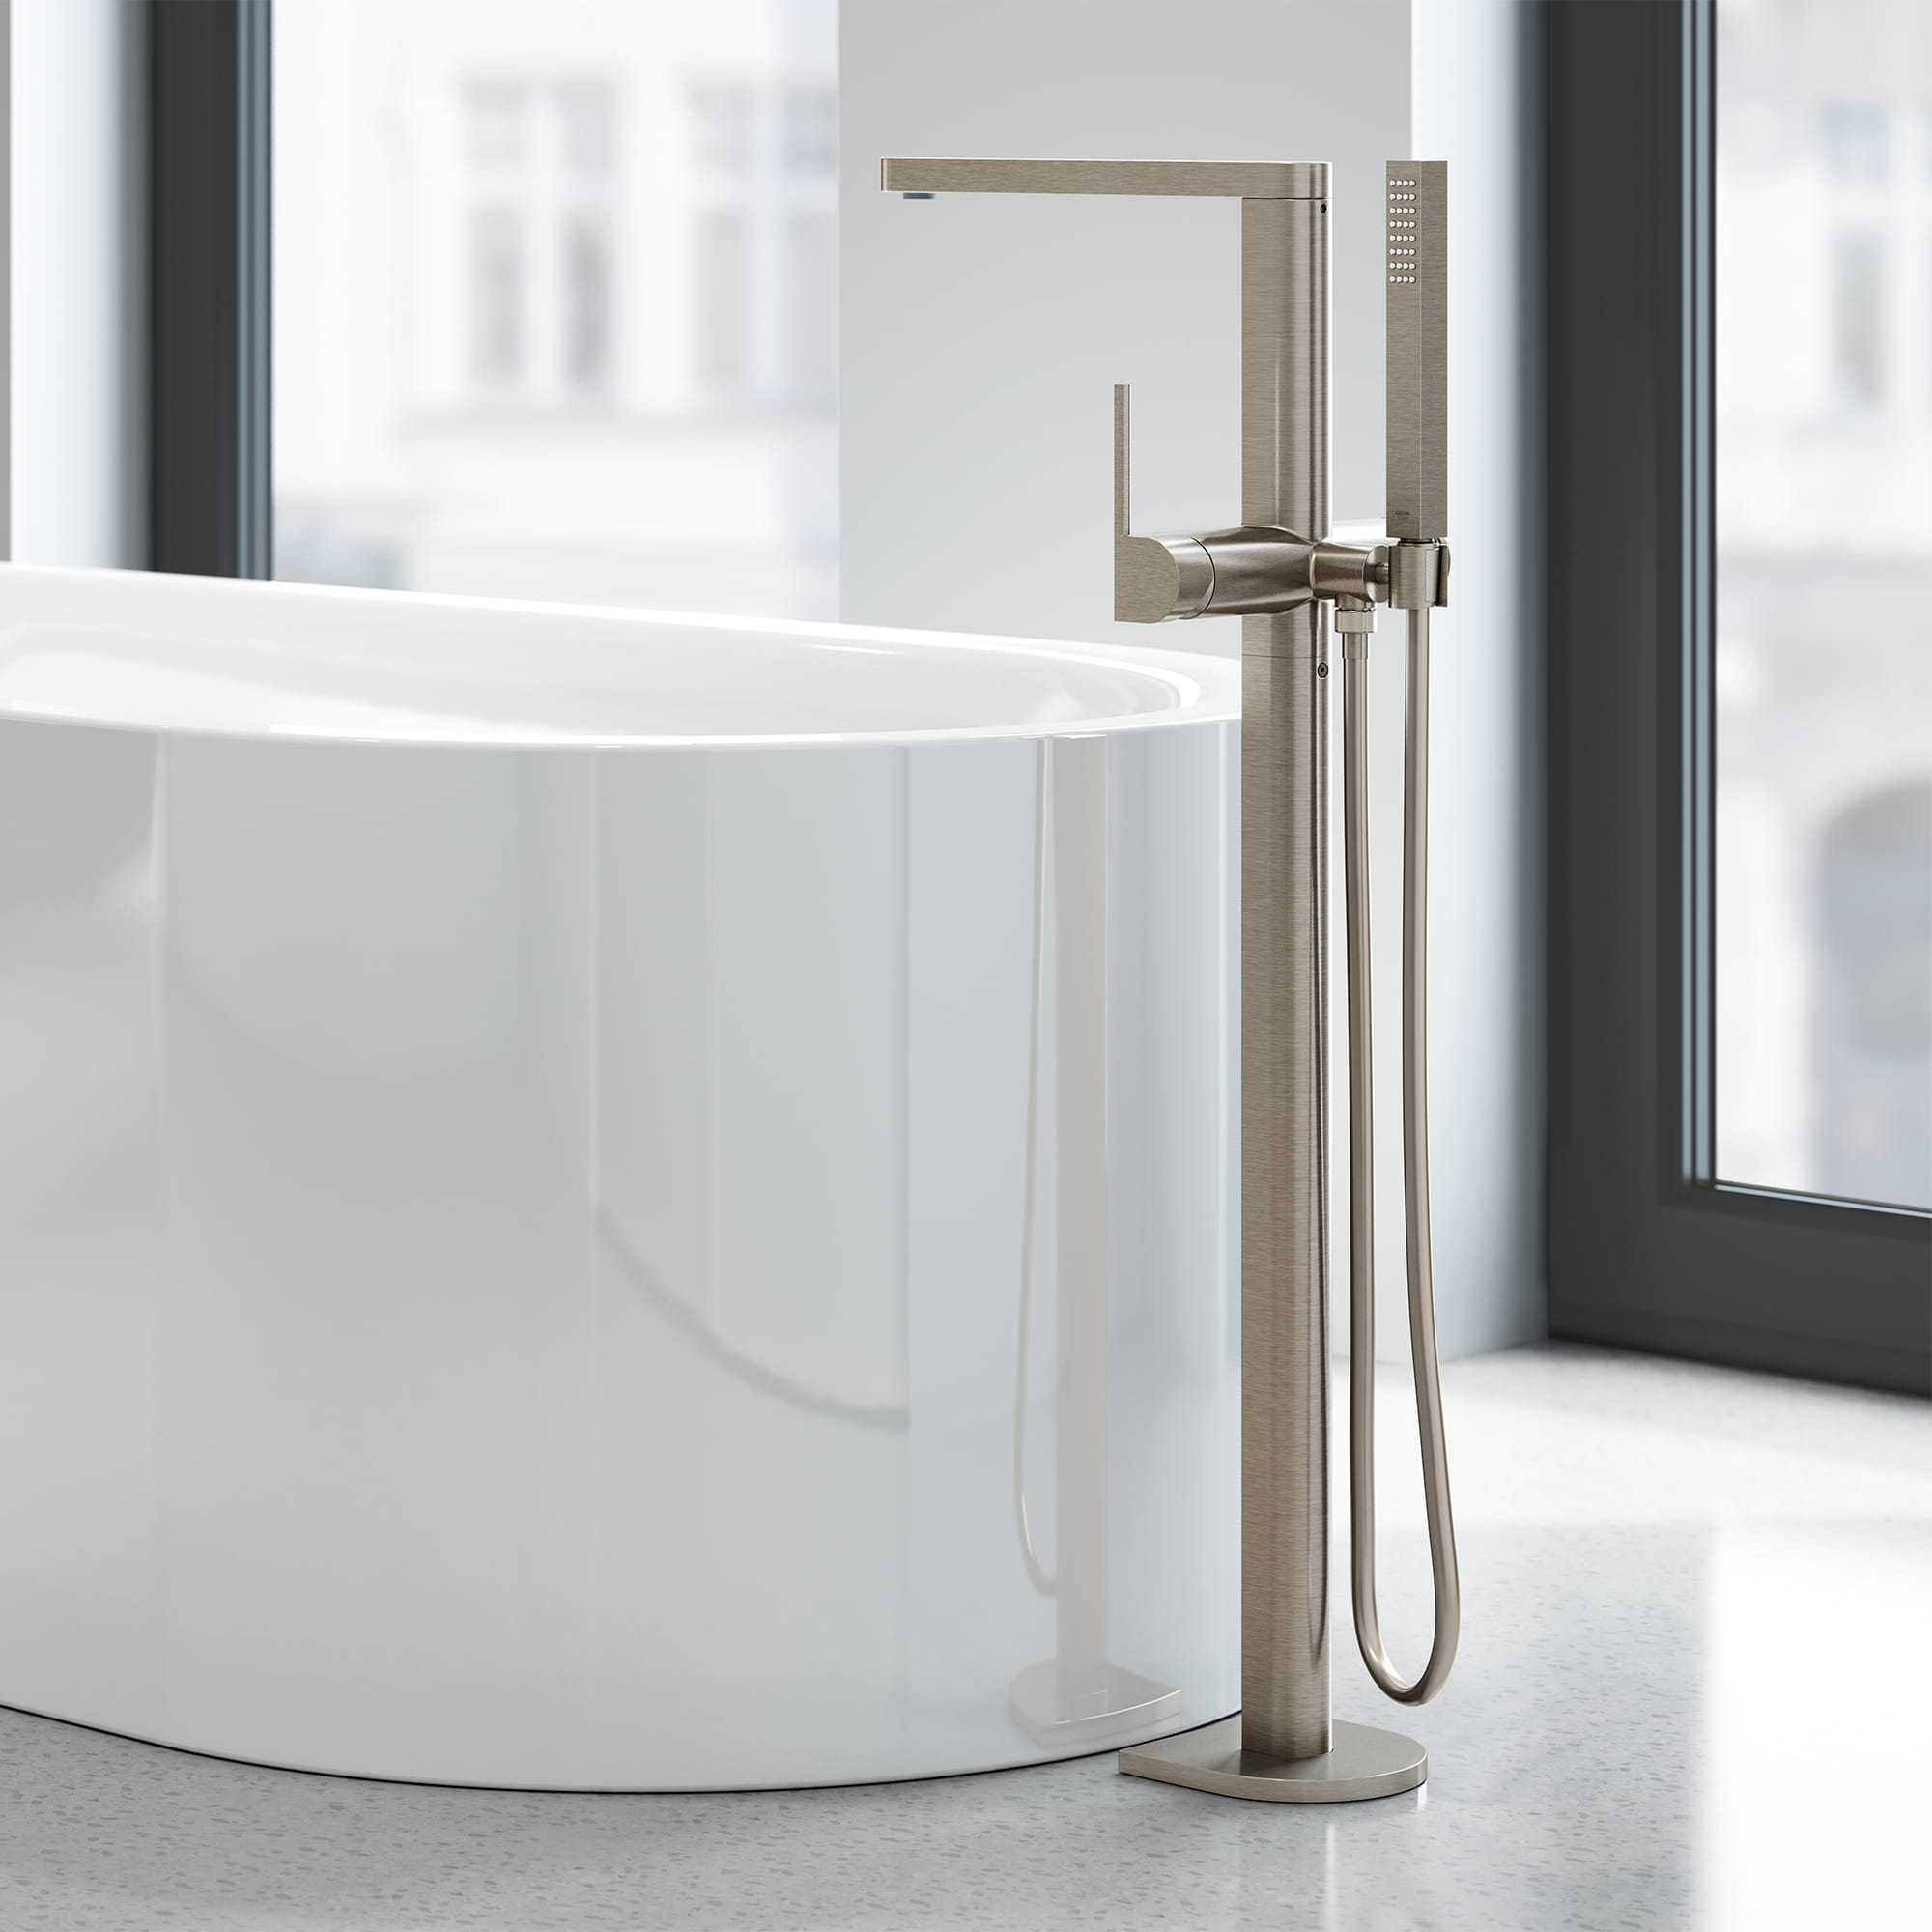 Eurocube Tub Faucet